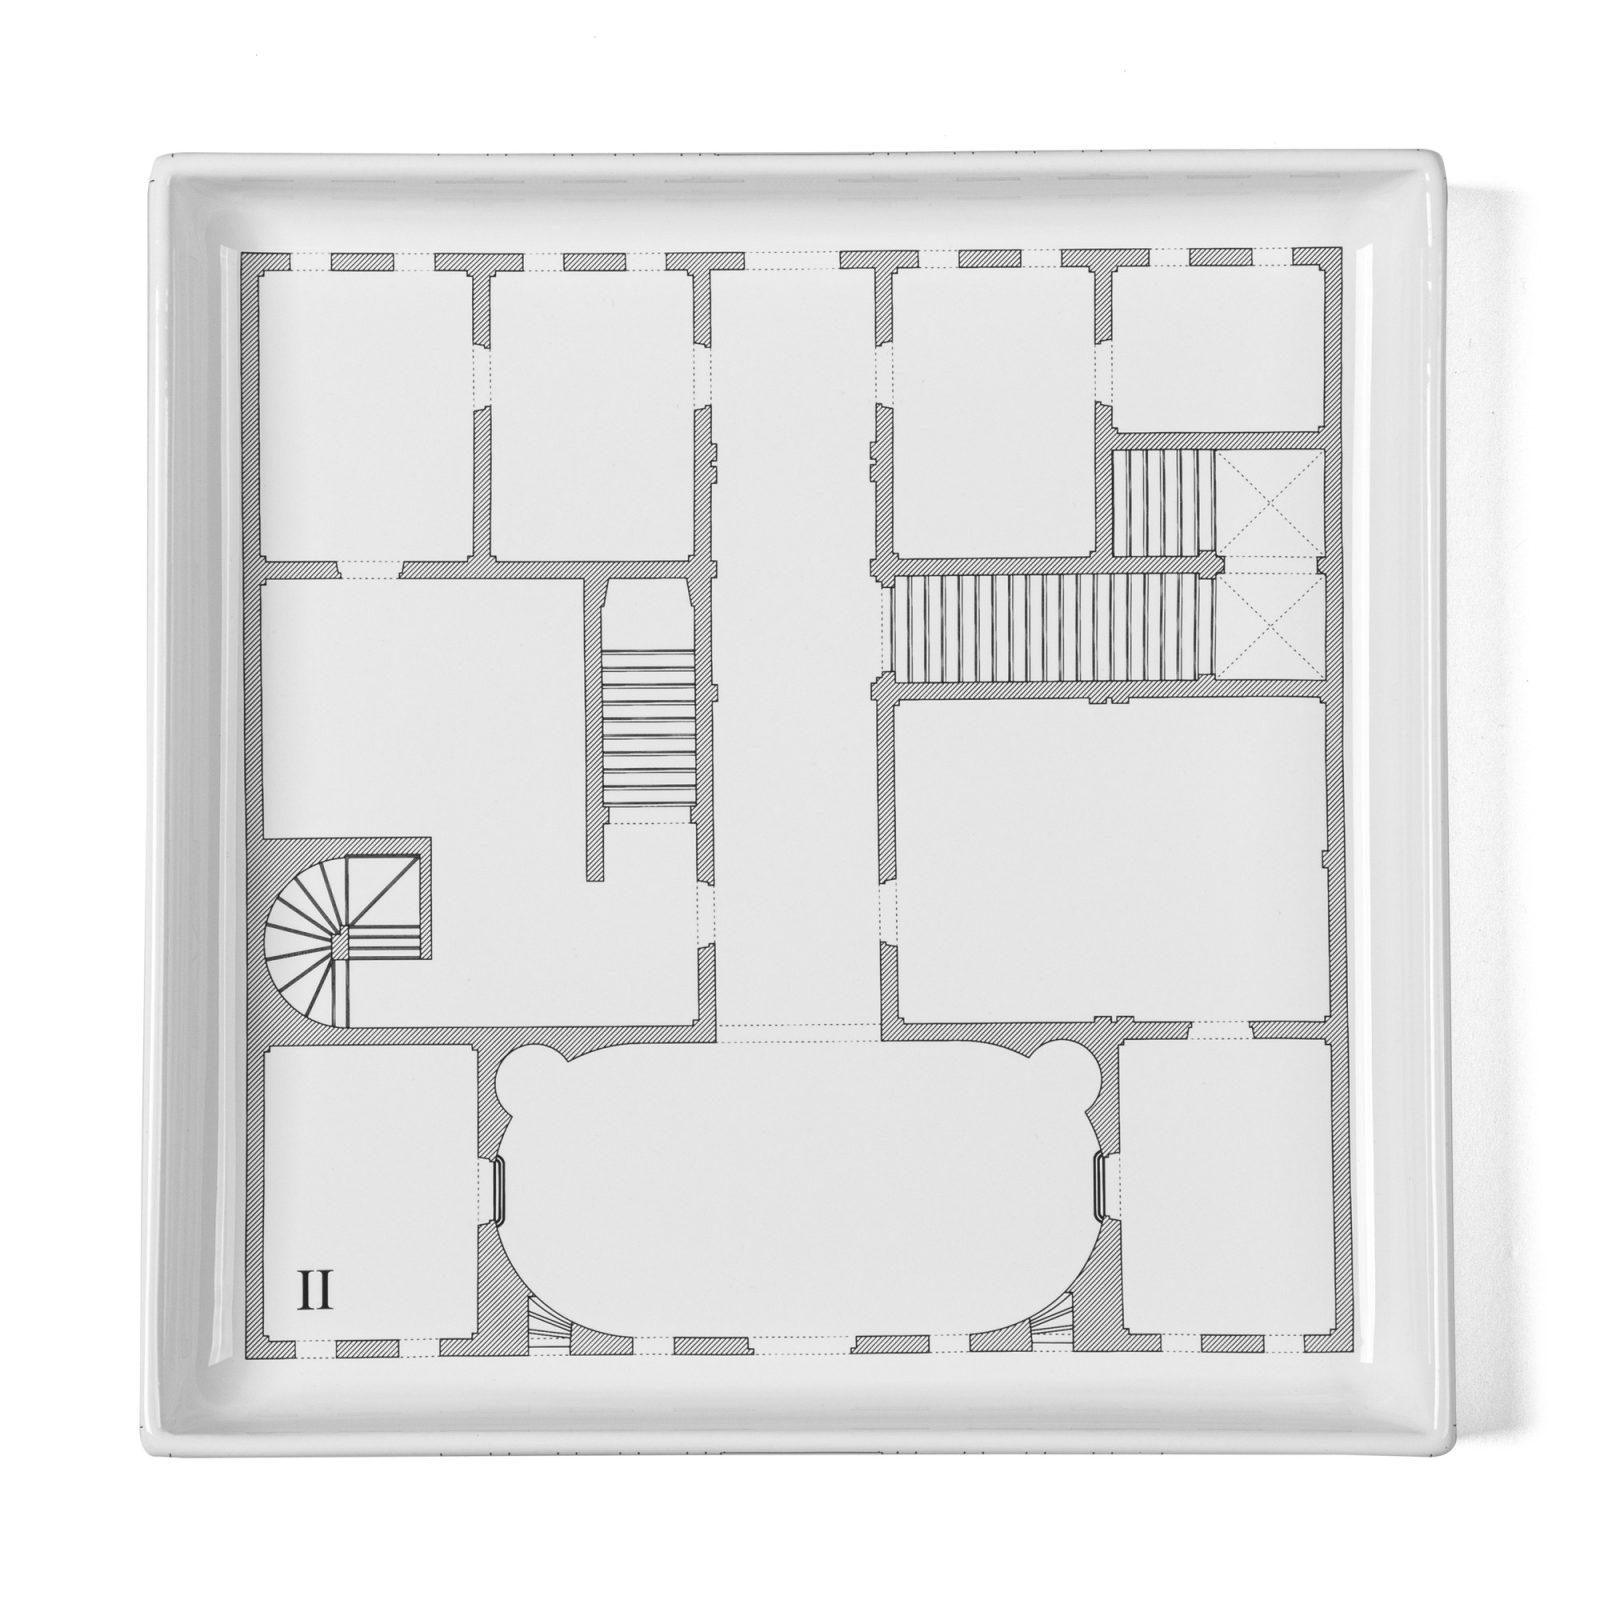 seletti-palace-collection-signoria-palace-14